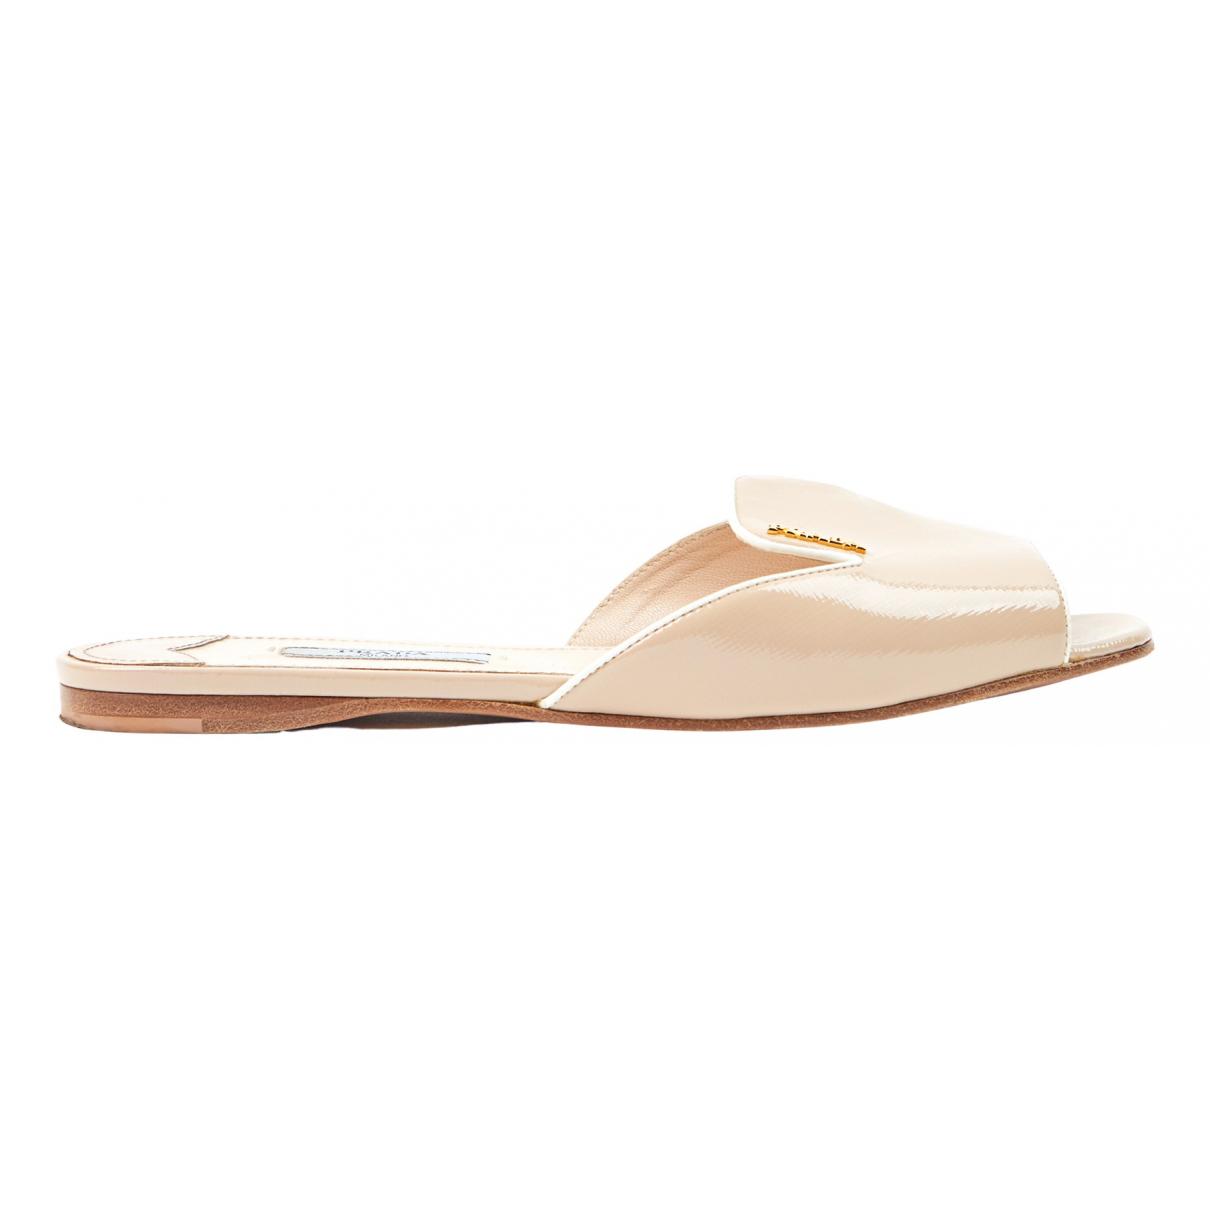 Prada N Beige Leather Sandals for Women 36.5 EU